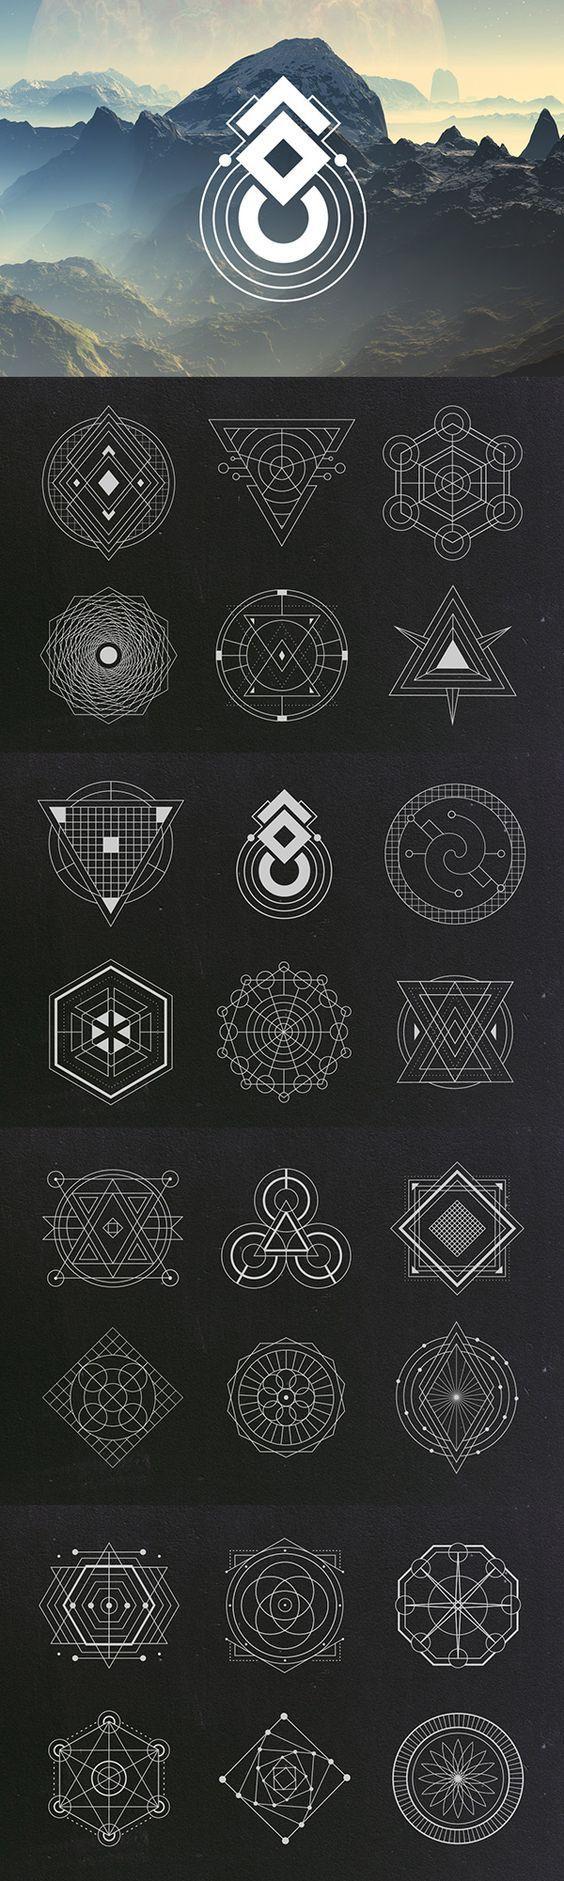 Sacred Geometry Vectors | Graphic Design Elements …